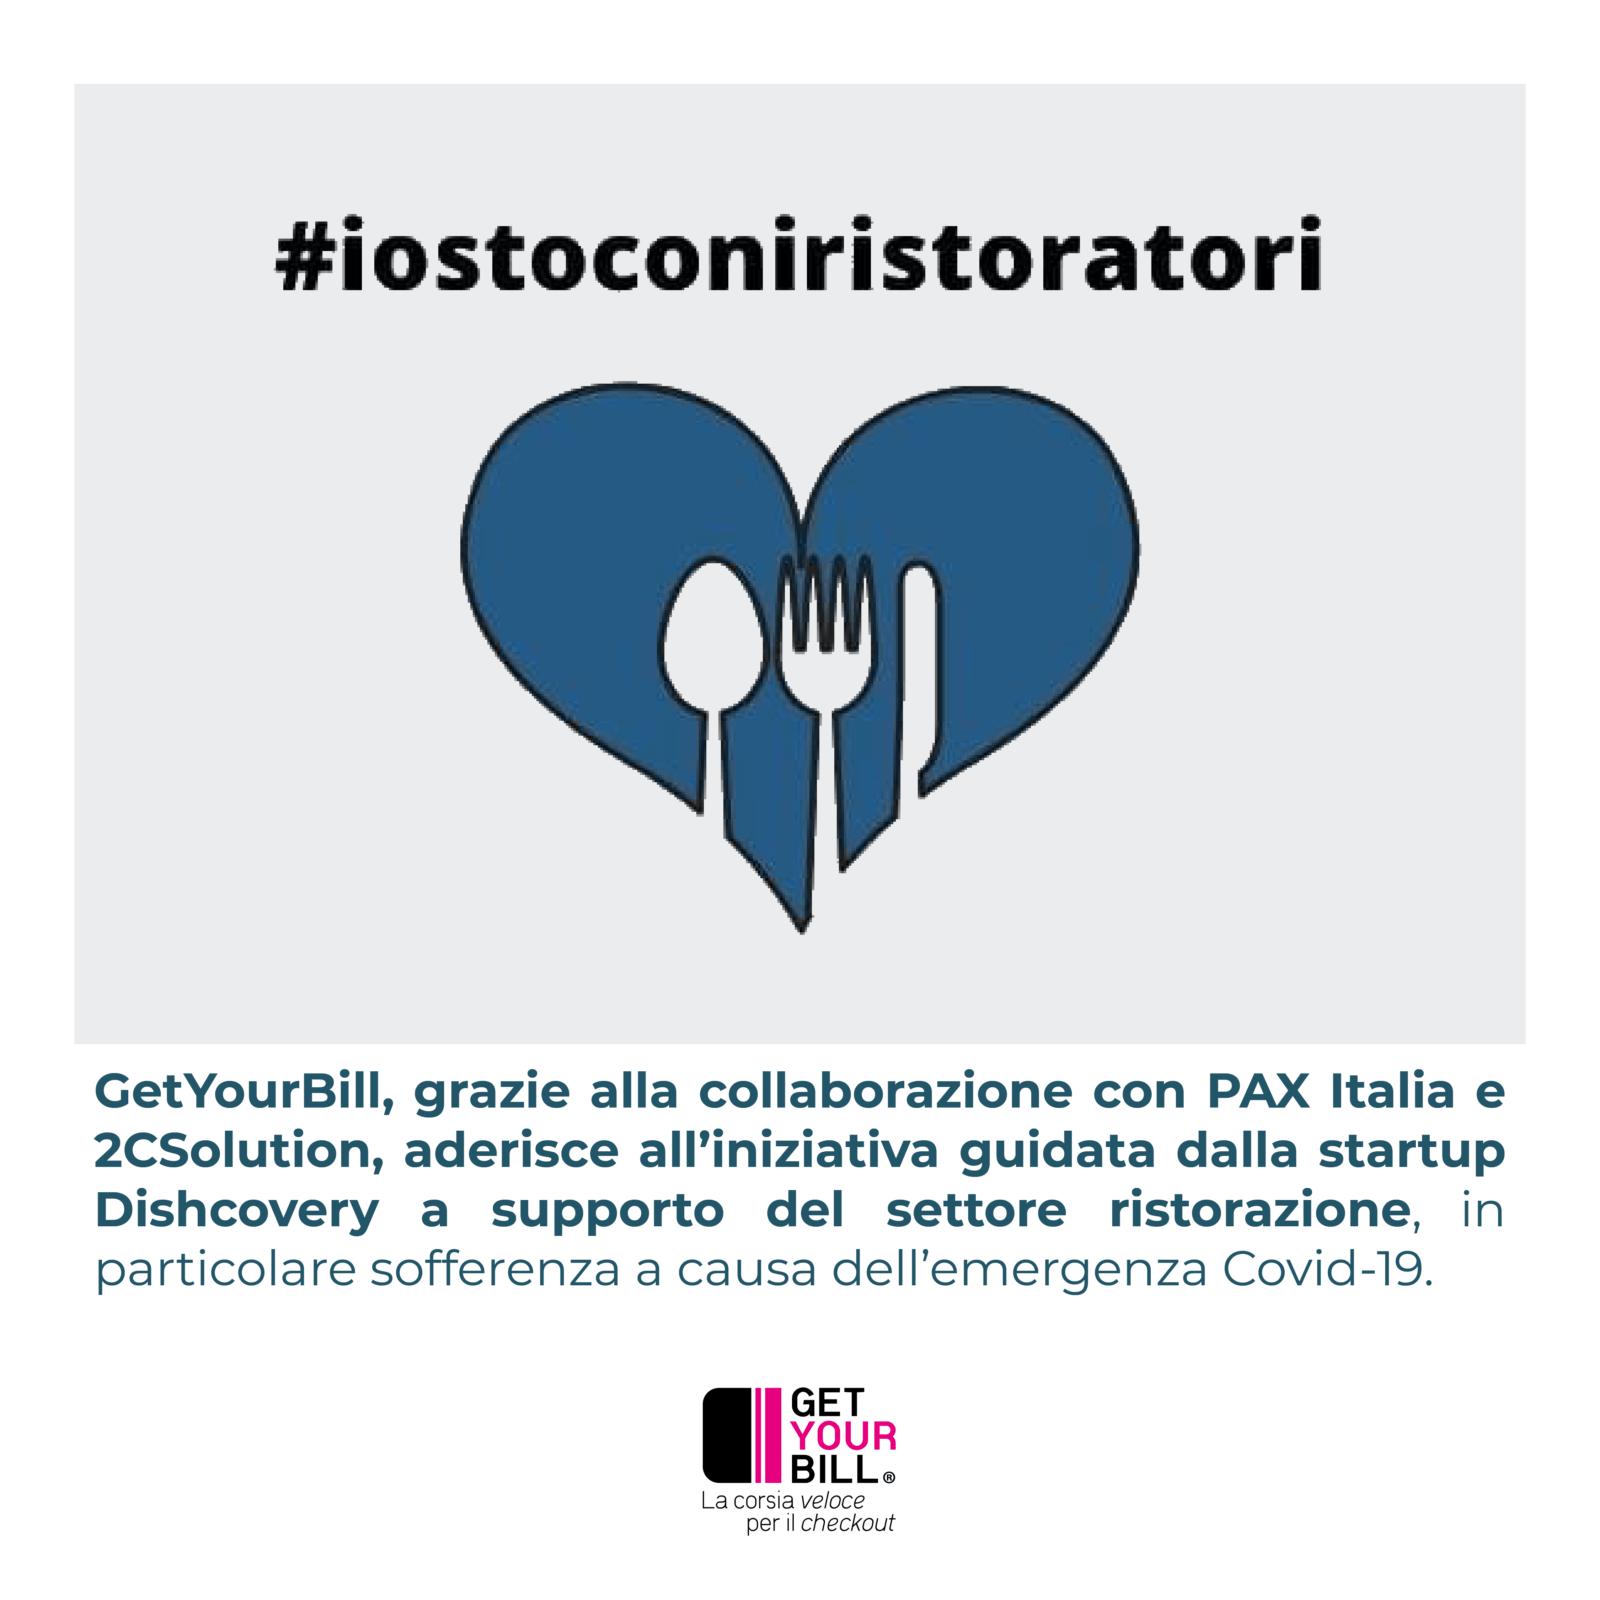 Post Instagram - #iostoconiristoratori